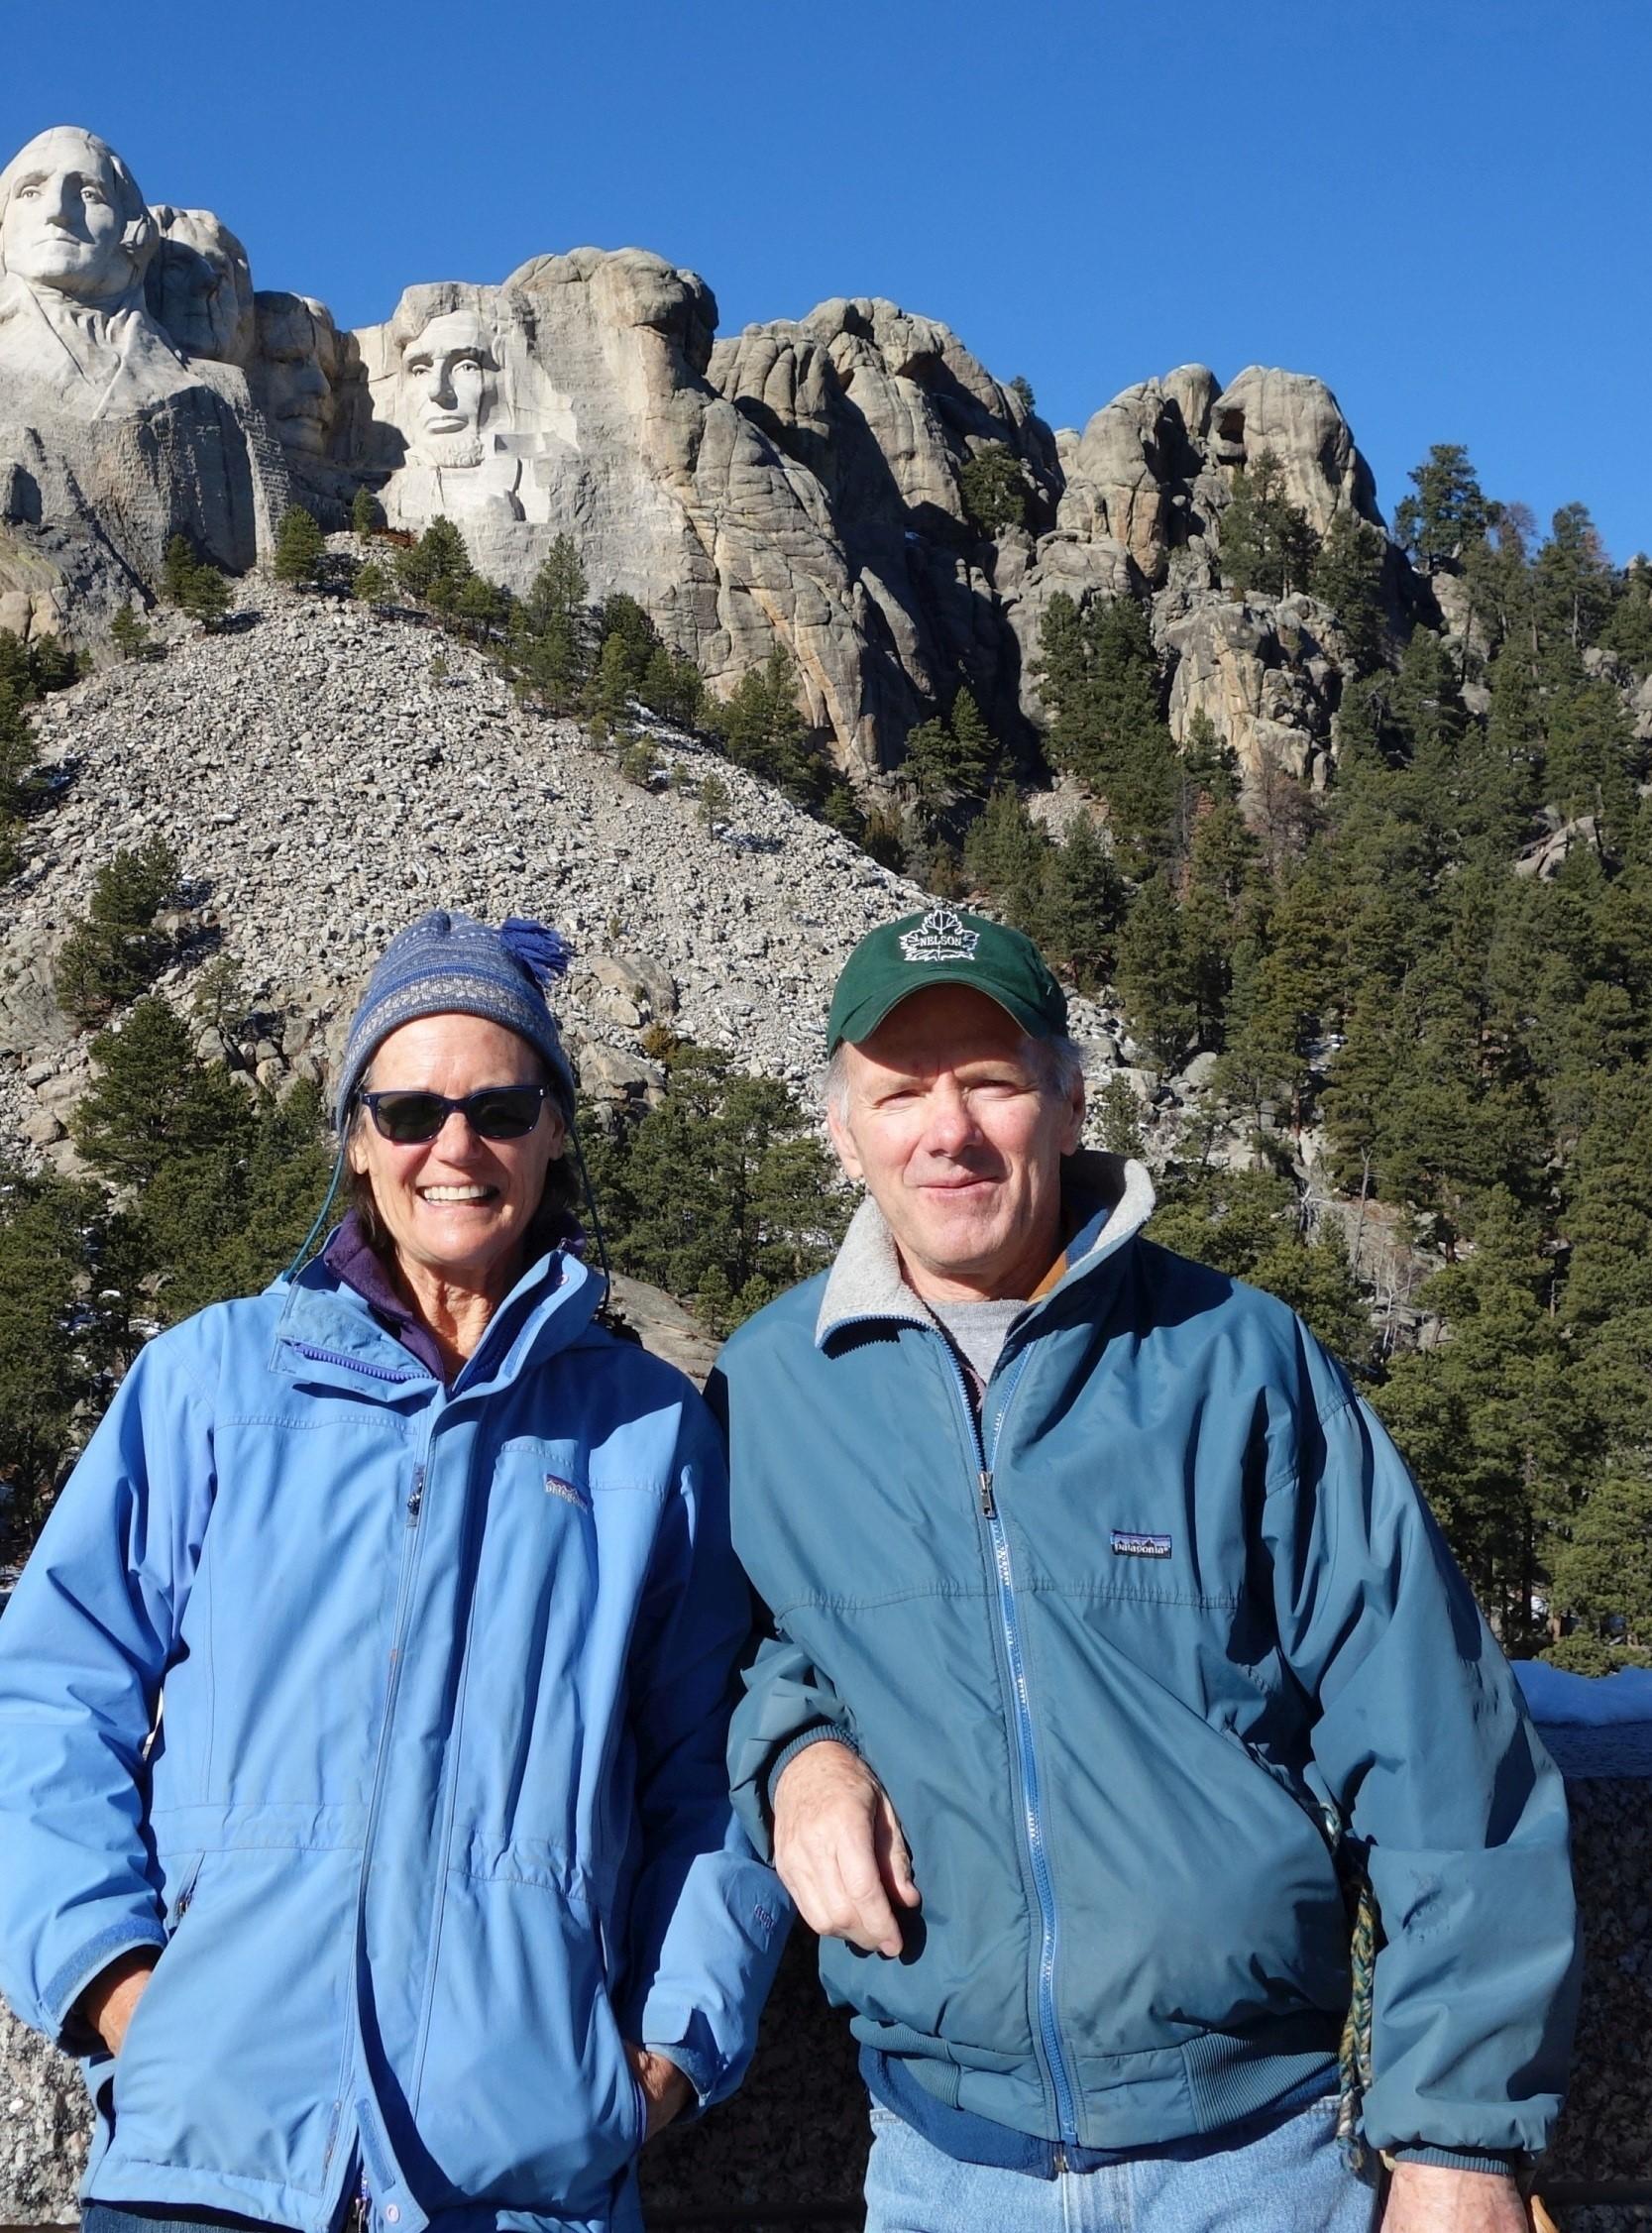 Princie and Bob Falkenhagen, Washington State (from Easton!)